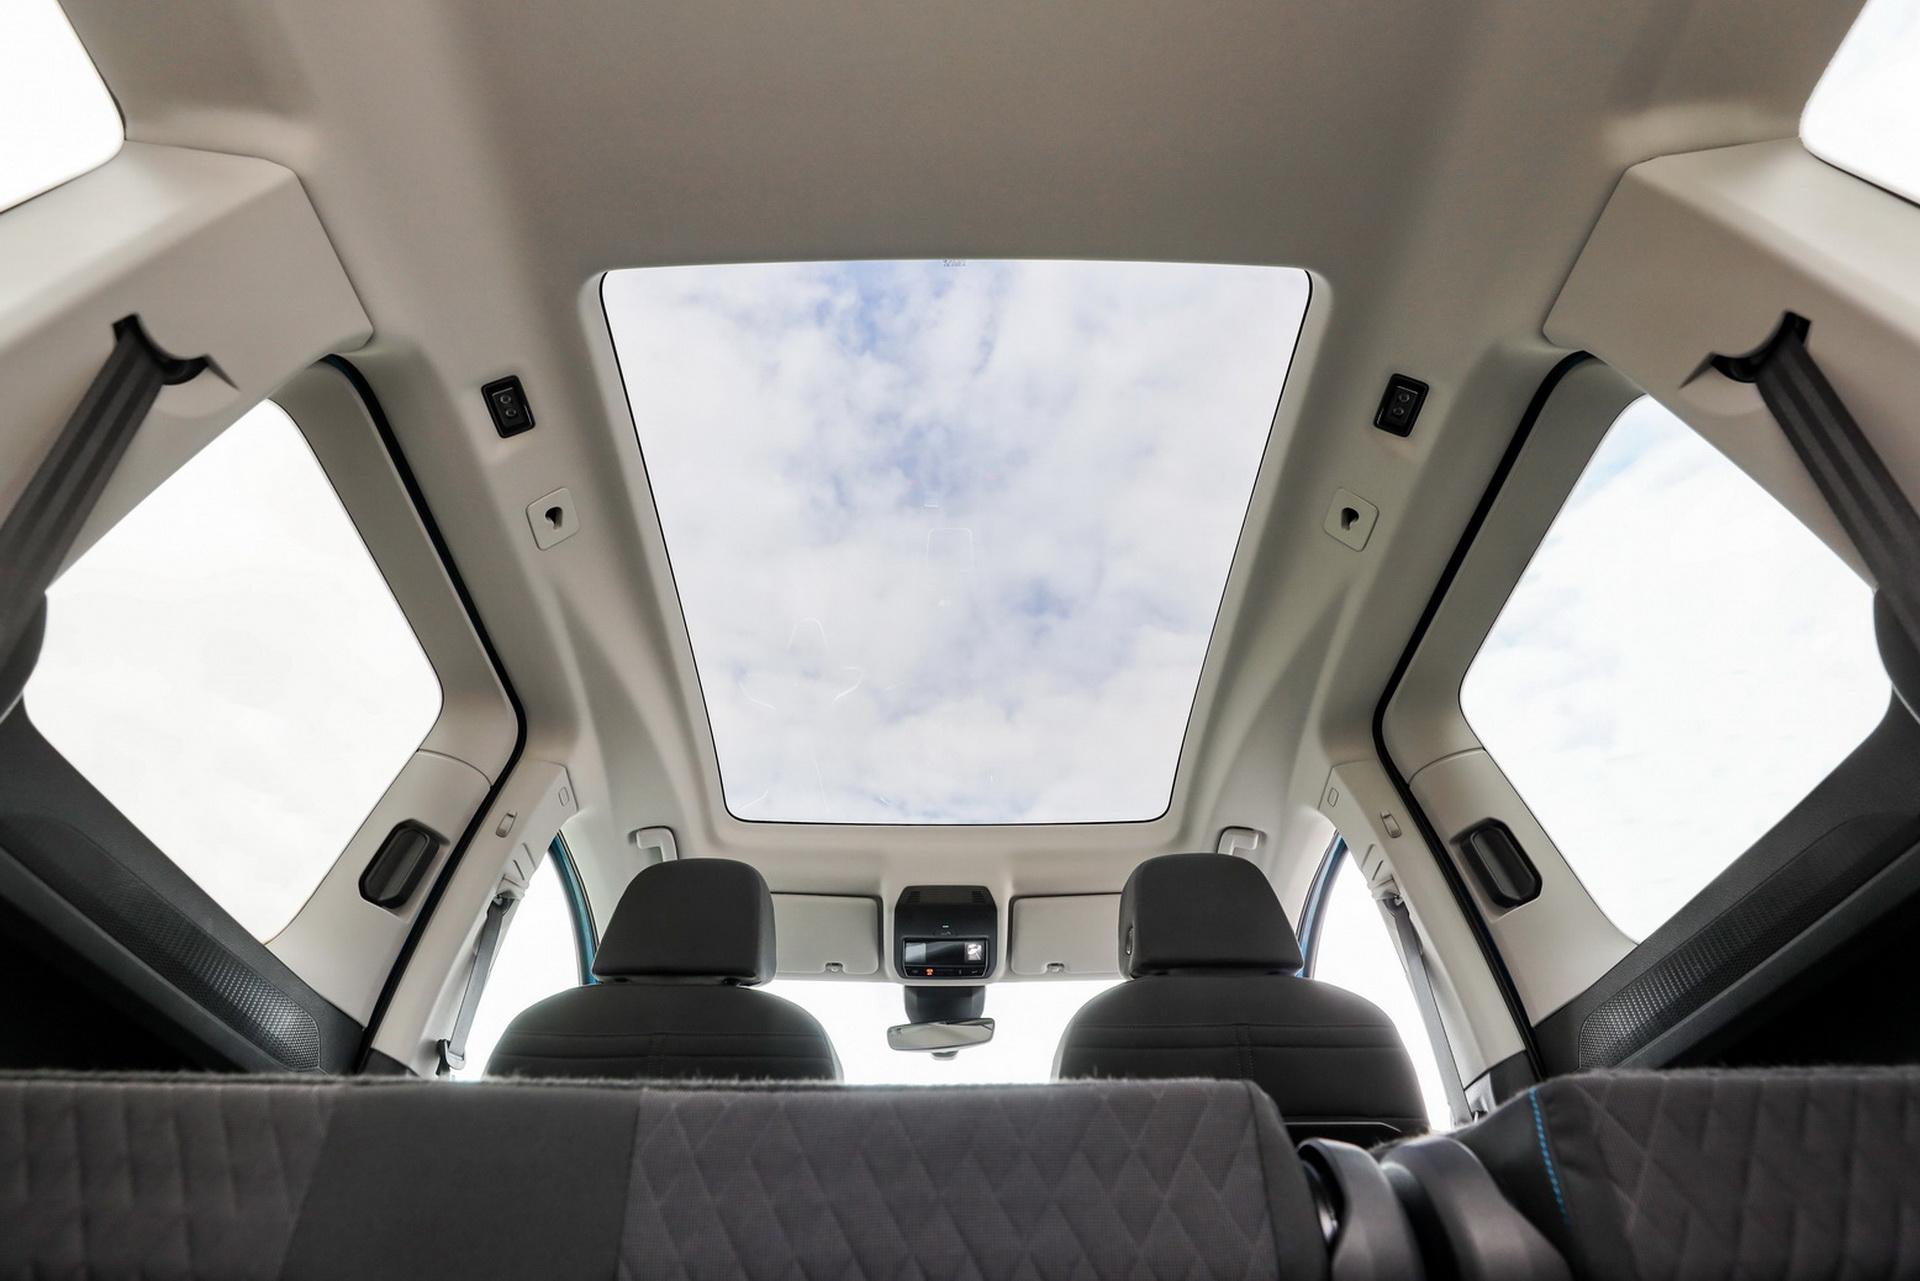 Caddy 5 - до 19 систем помощи водителю